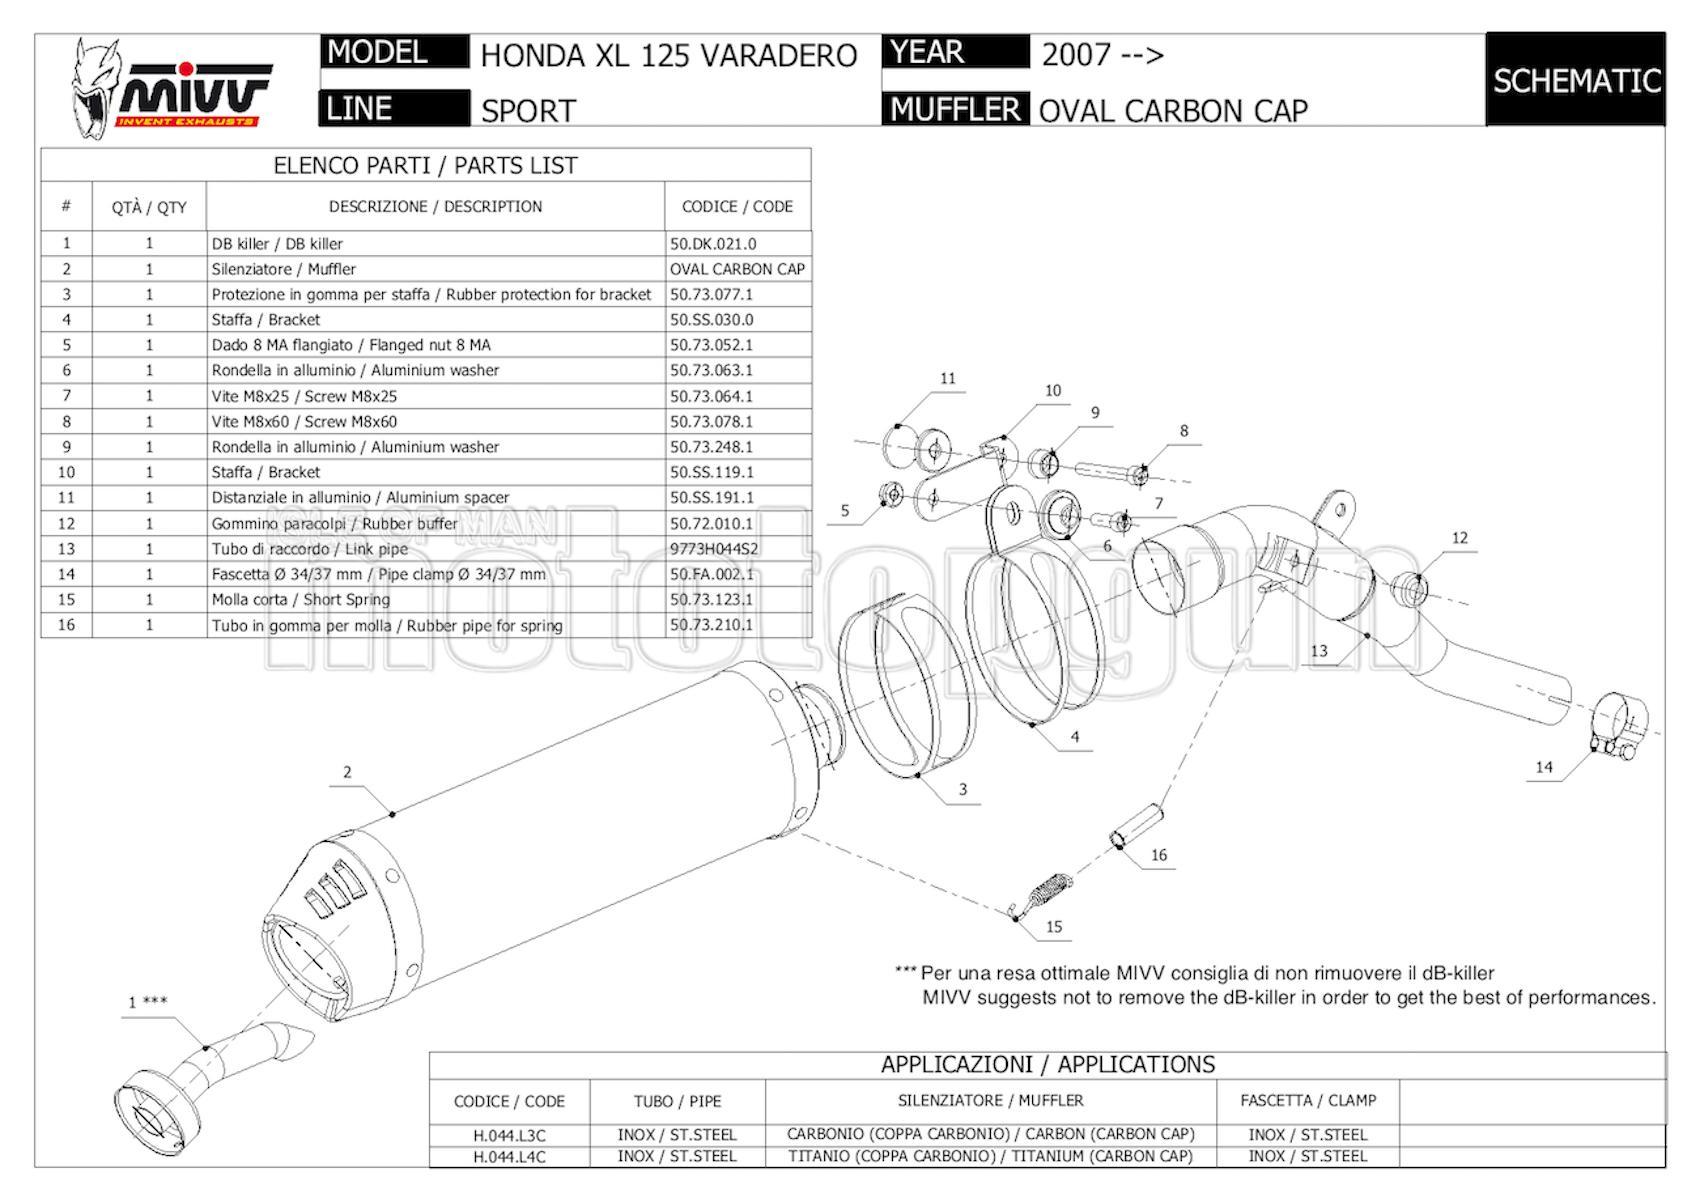 MIVV TUBO DE ESCAPE HOM OVAL CARBONO COPA CARBONO XL 125 VARADERO 2007 07 H.044.L3C